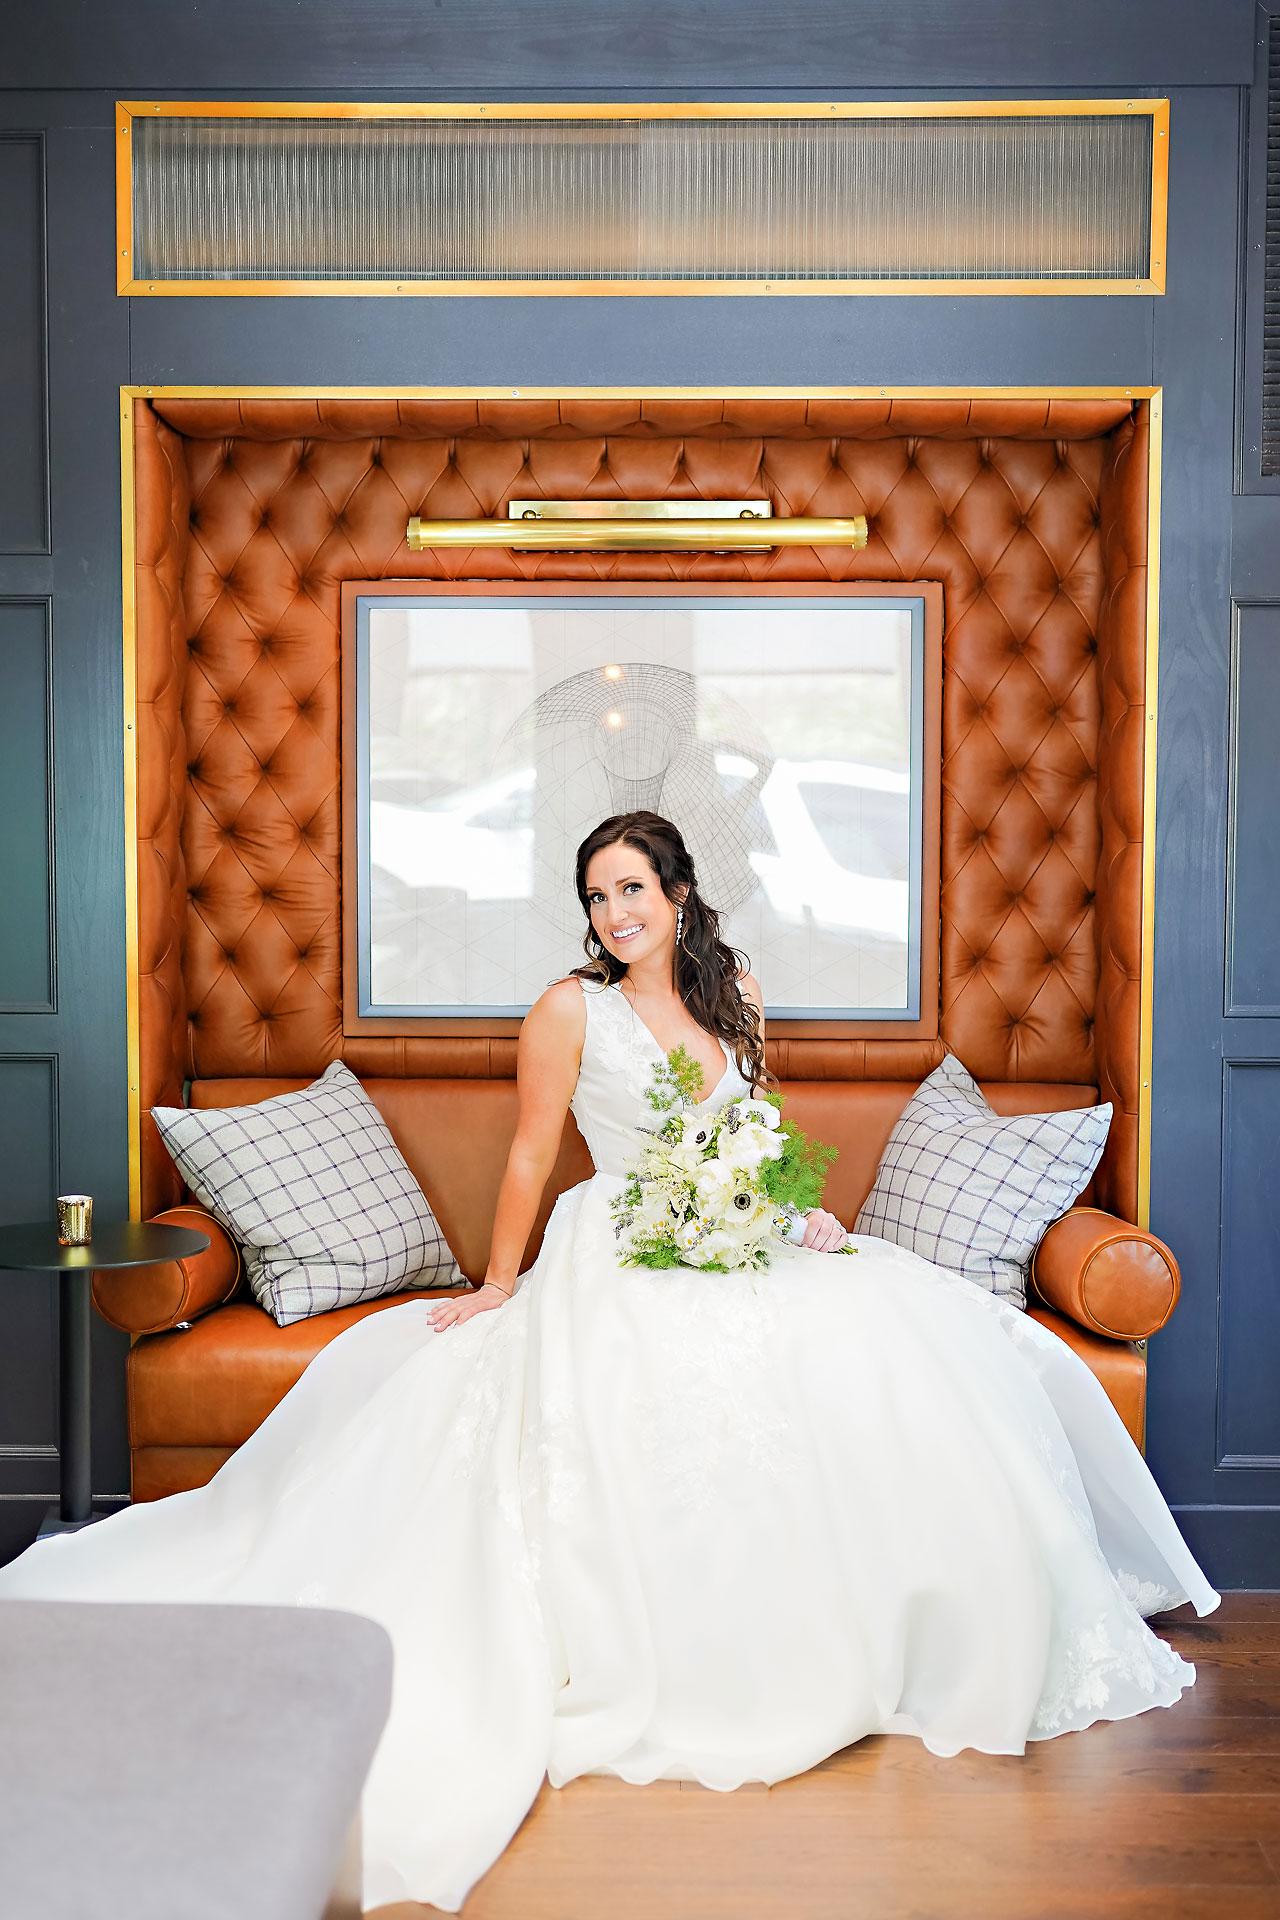 MacKinze John Lafayette Indiana Purdue Wedding 062